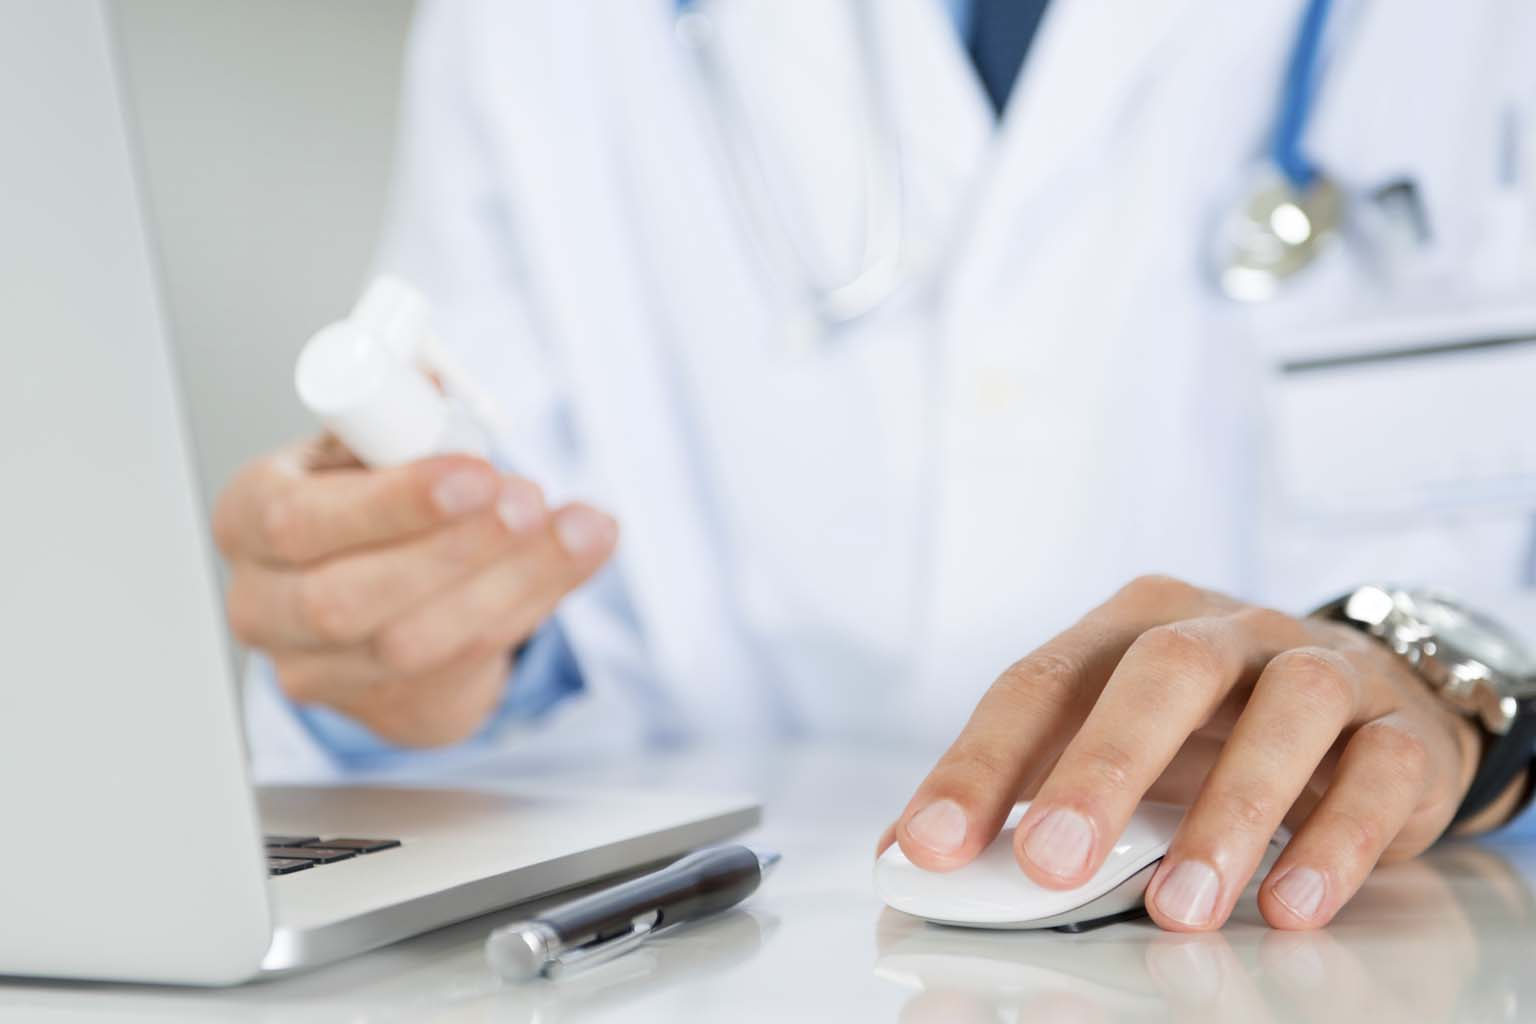 phamacist holding bottle of pills while using computer